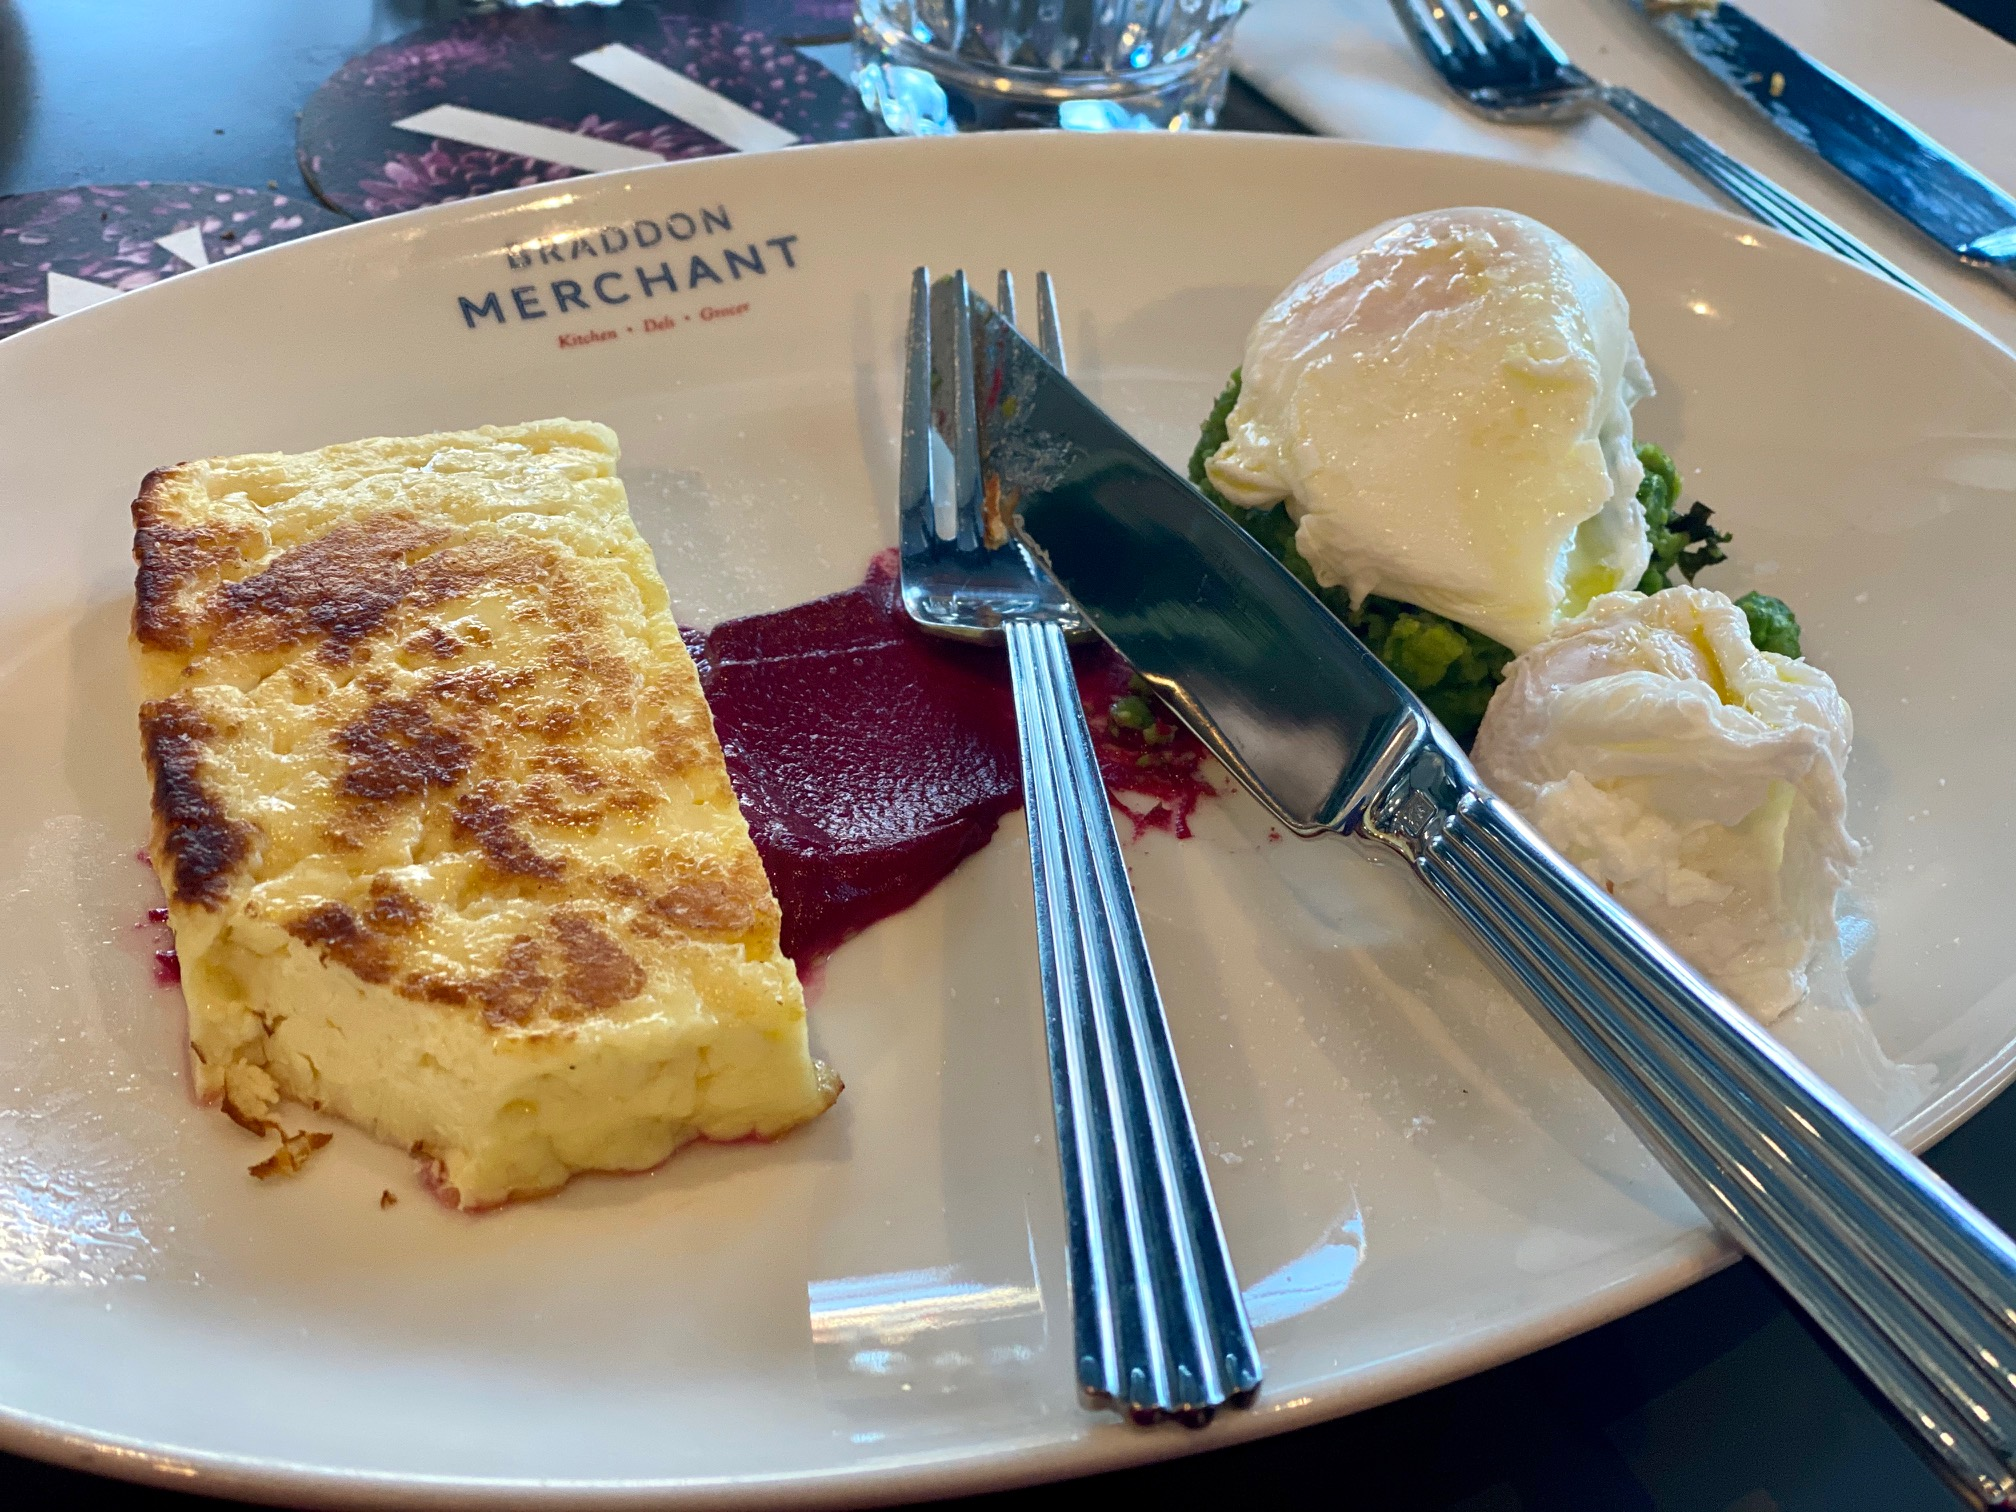 Breakfast at Braddon Merchant, Midnight Hotel Canberra